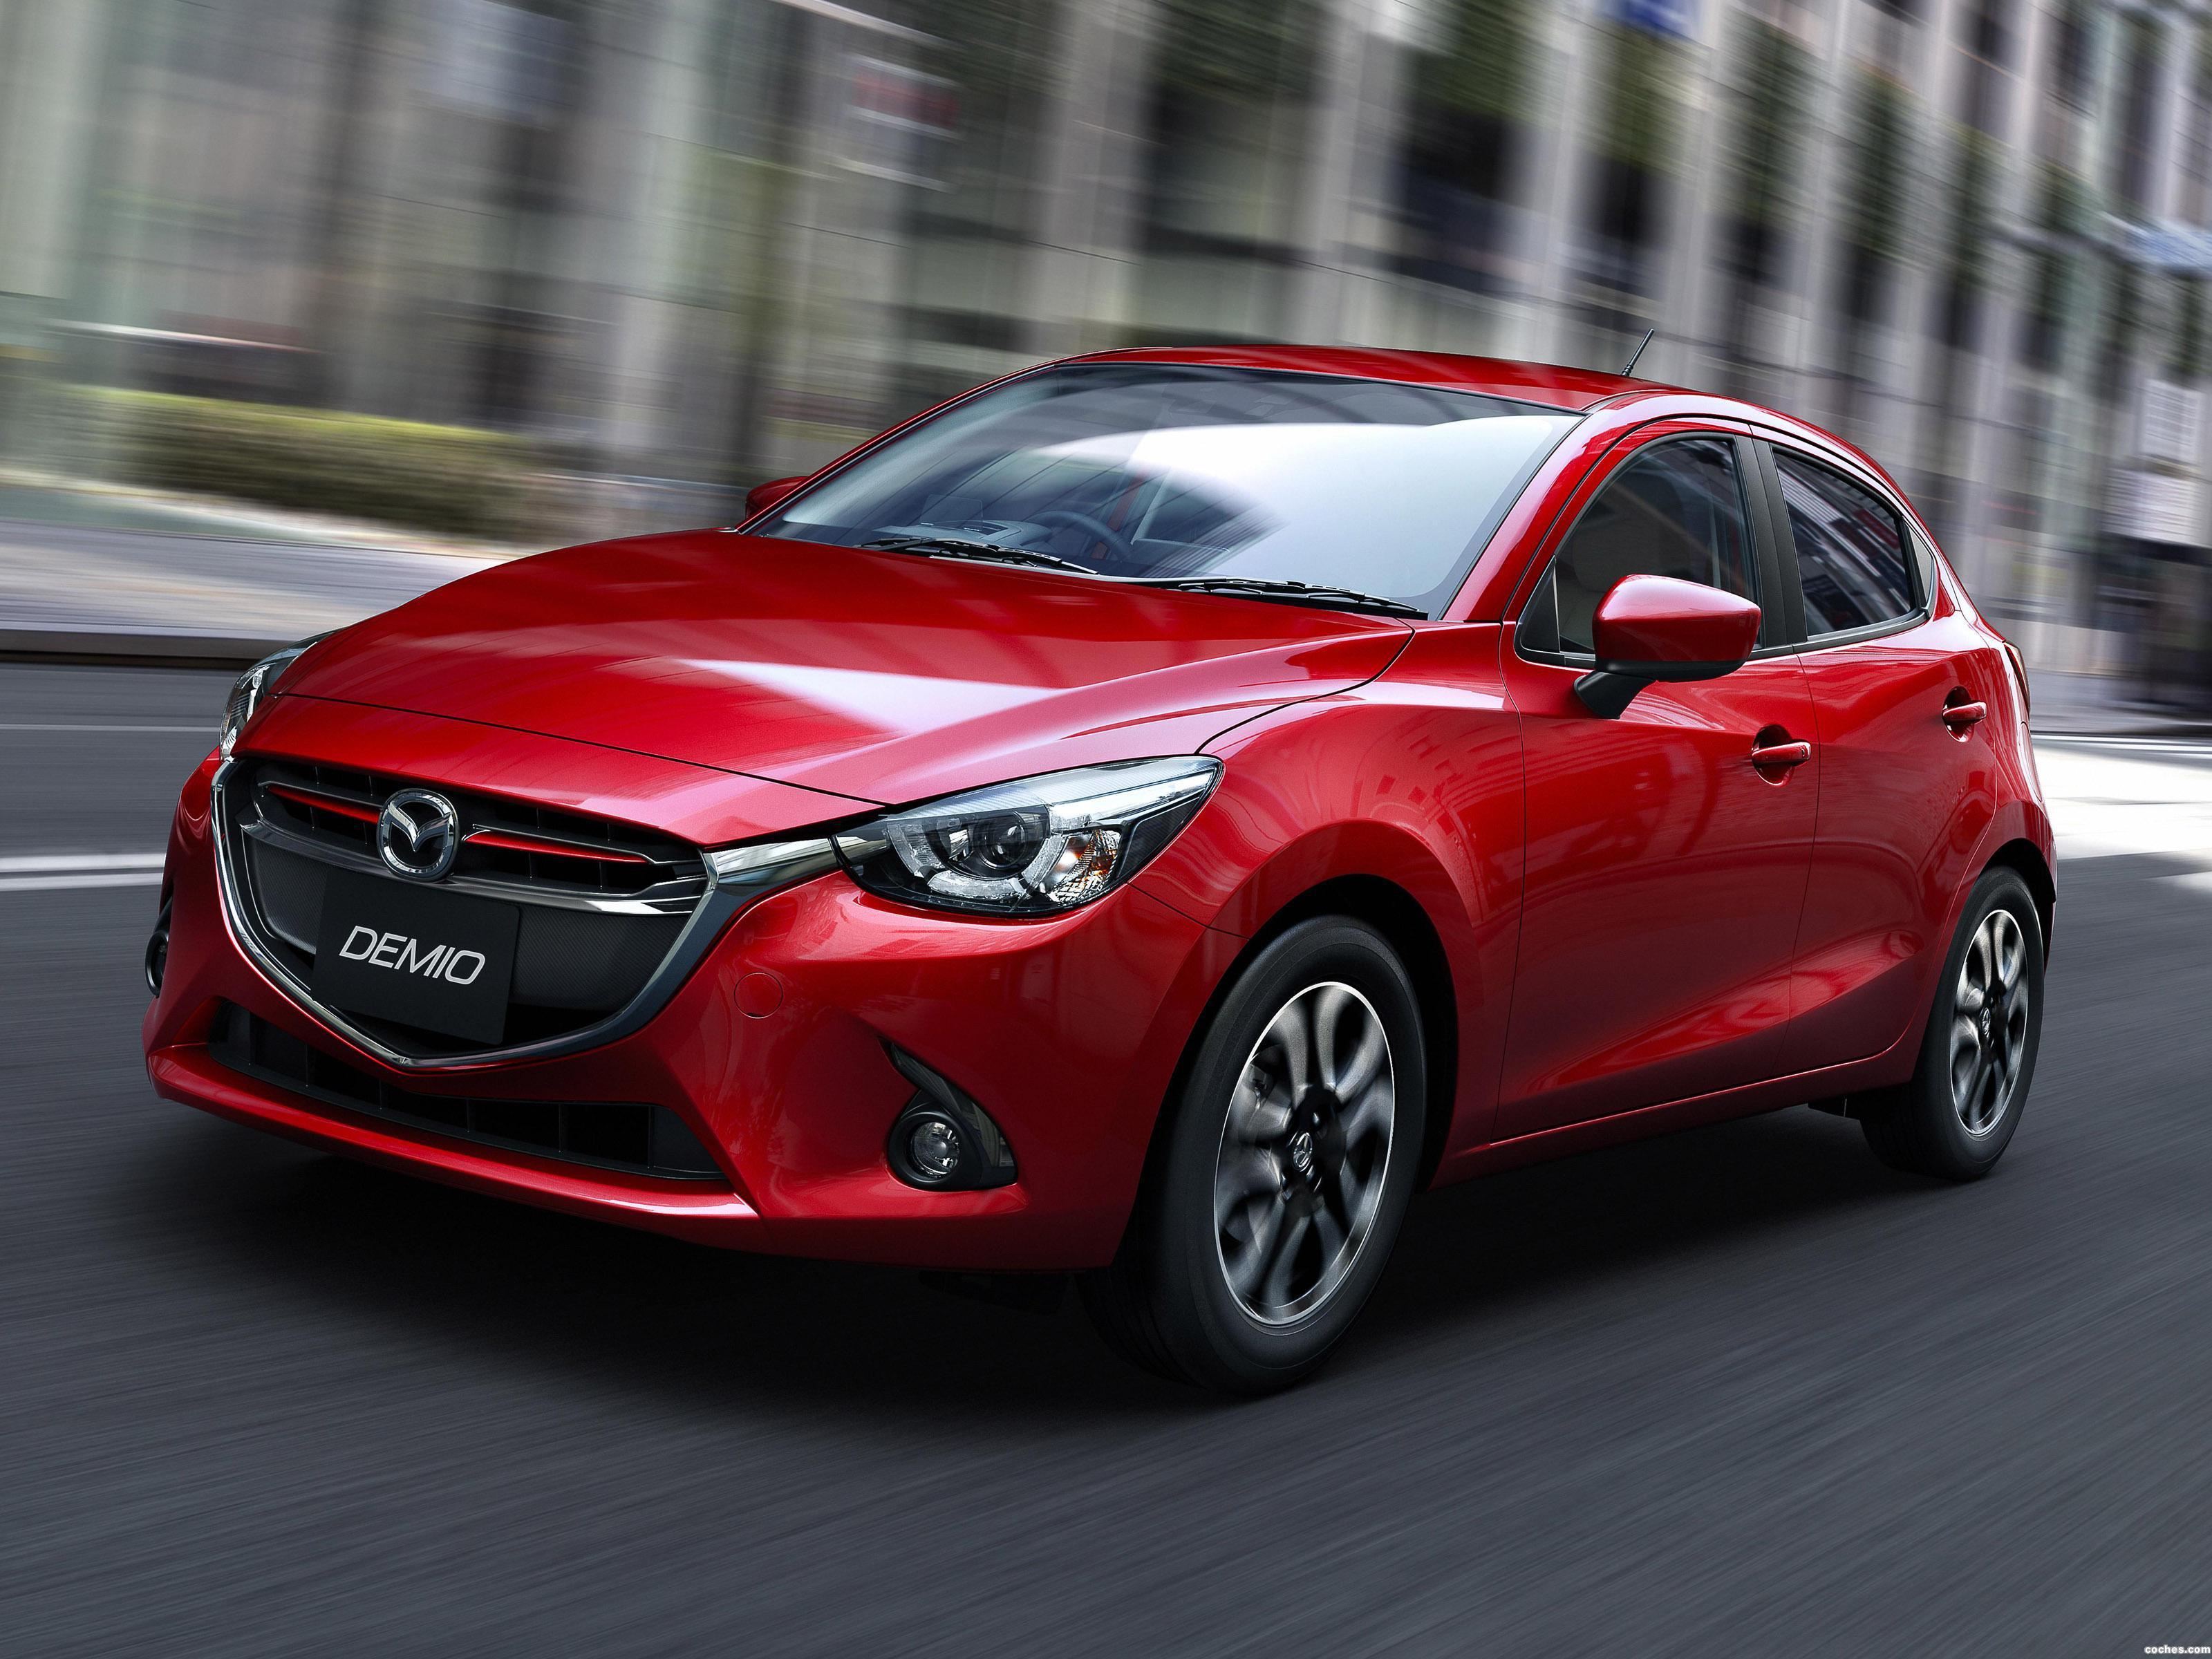 Fotos De Mazda Demio 2014